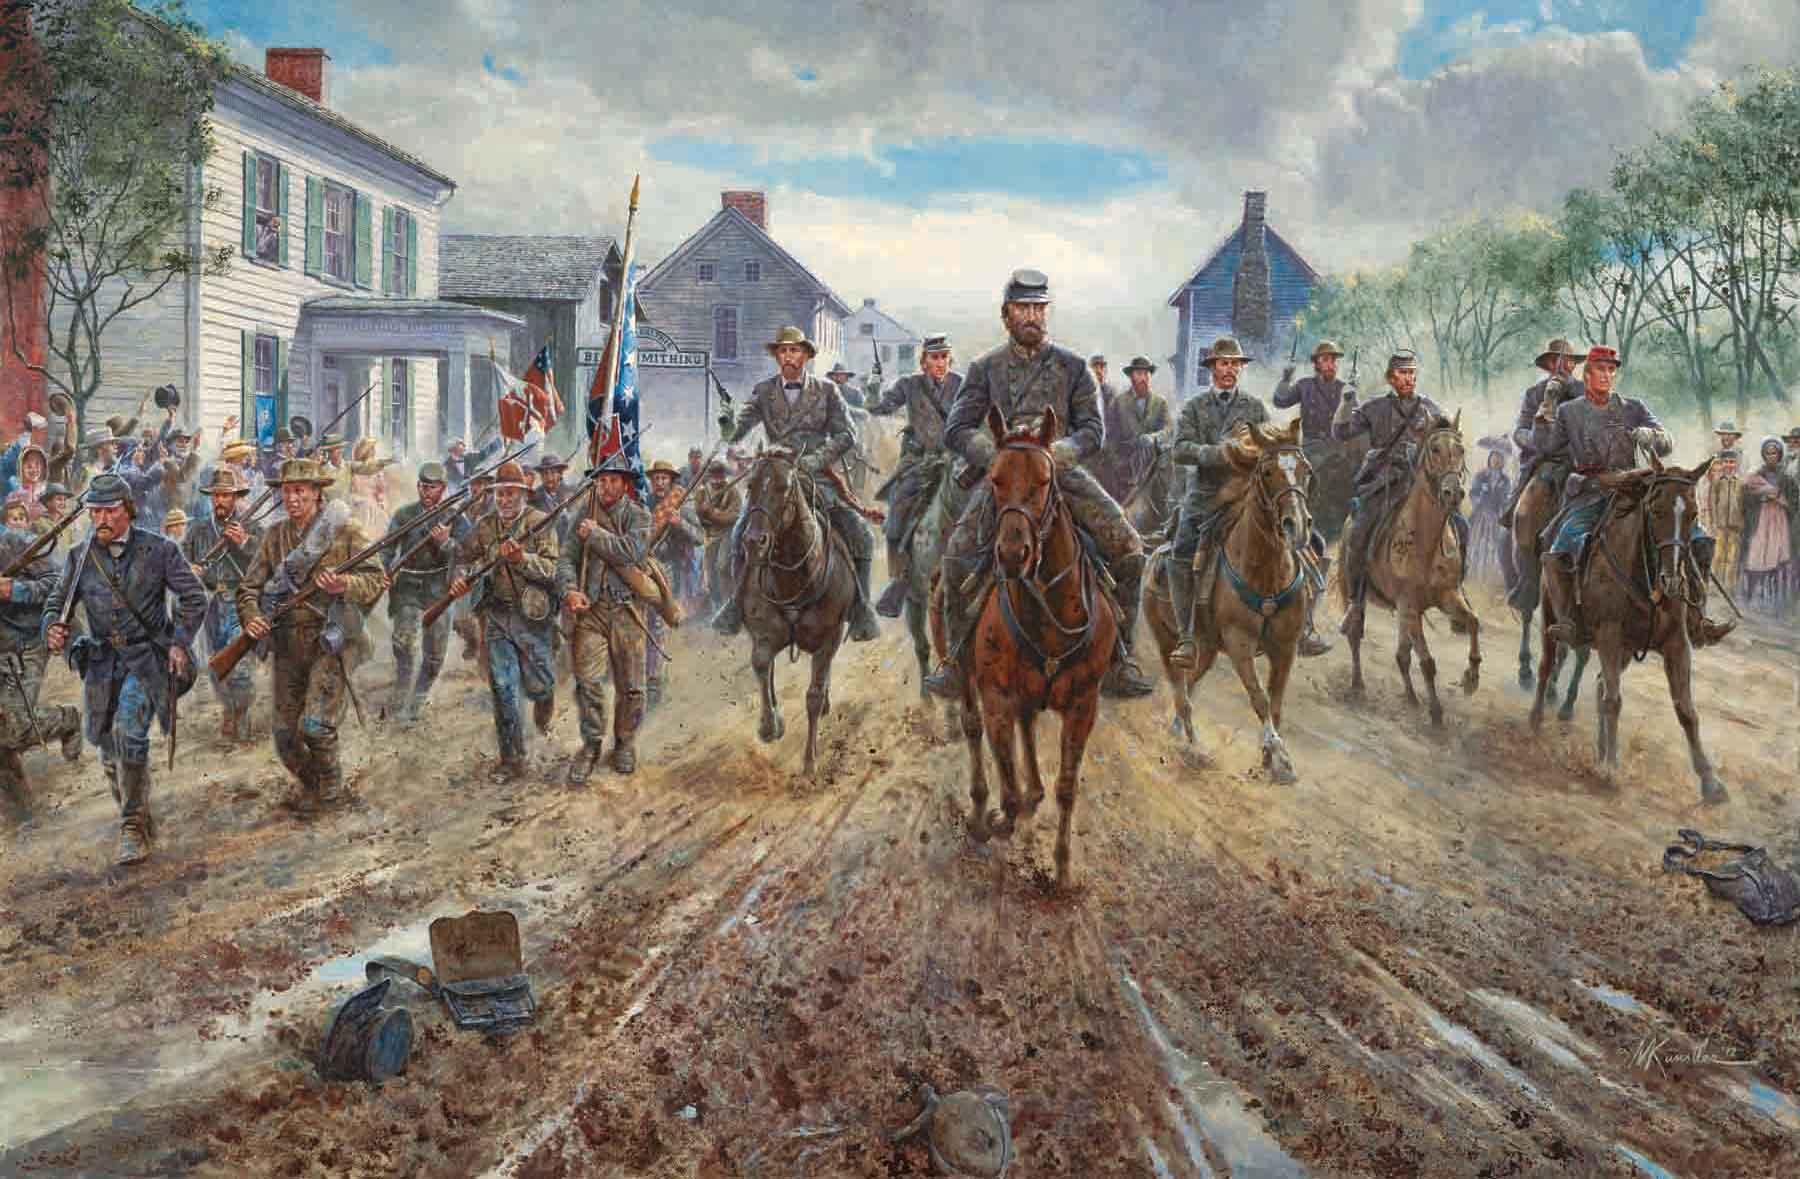 How to Appreciate the American Civil War